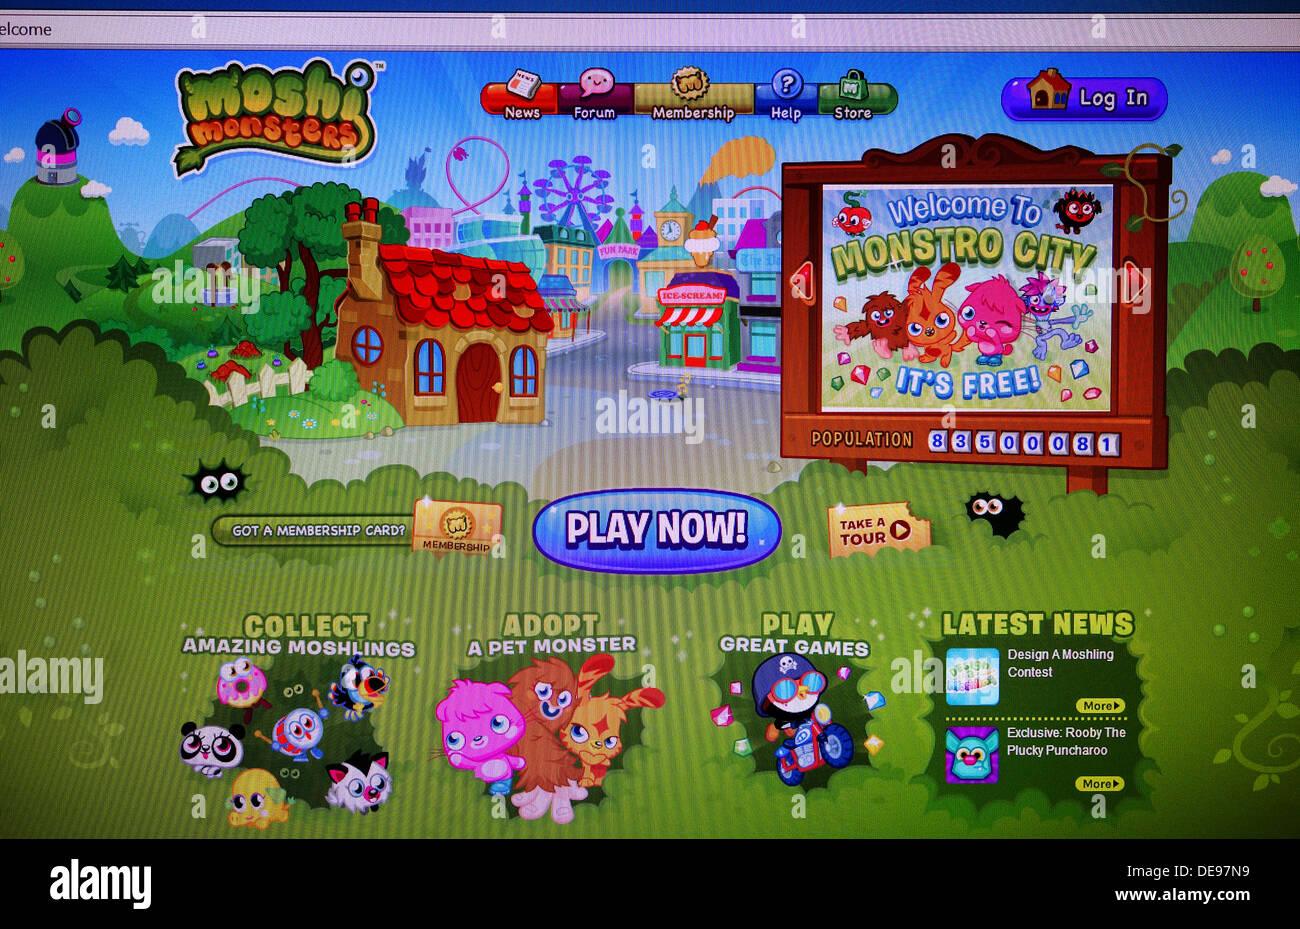 Moshi Monsters internet game - Stock Image